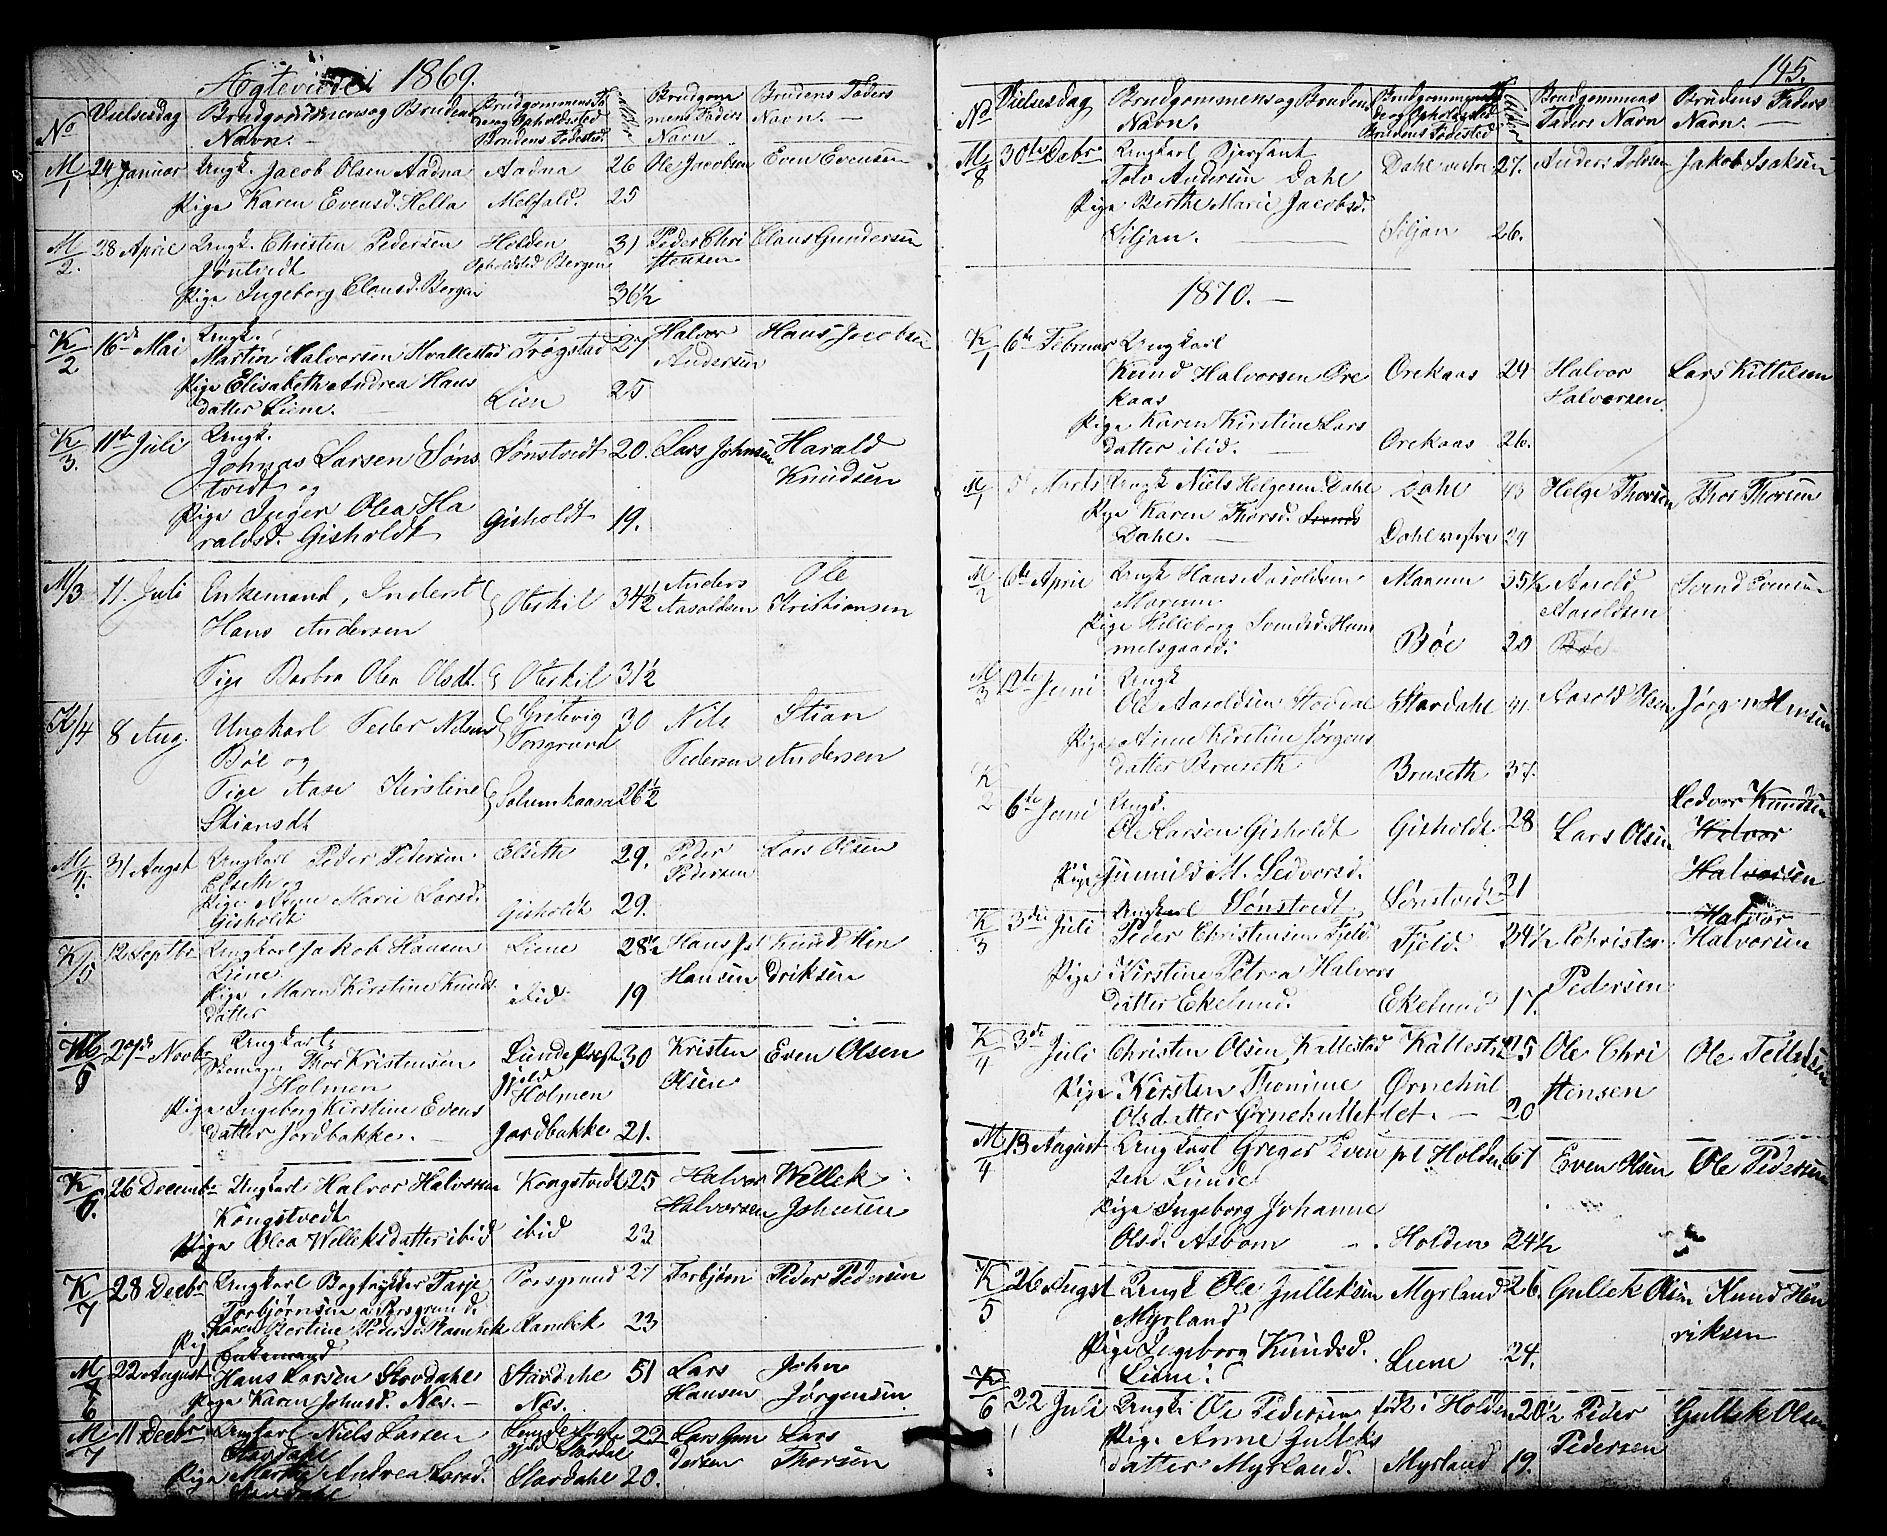 SAKO, Solum kirkebøker, G/Gb/L0002: Klokkerbok nr. II 2, 1859-1879, s. 145